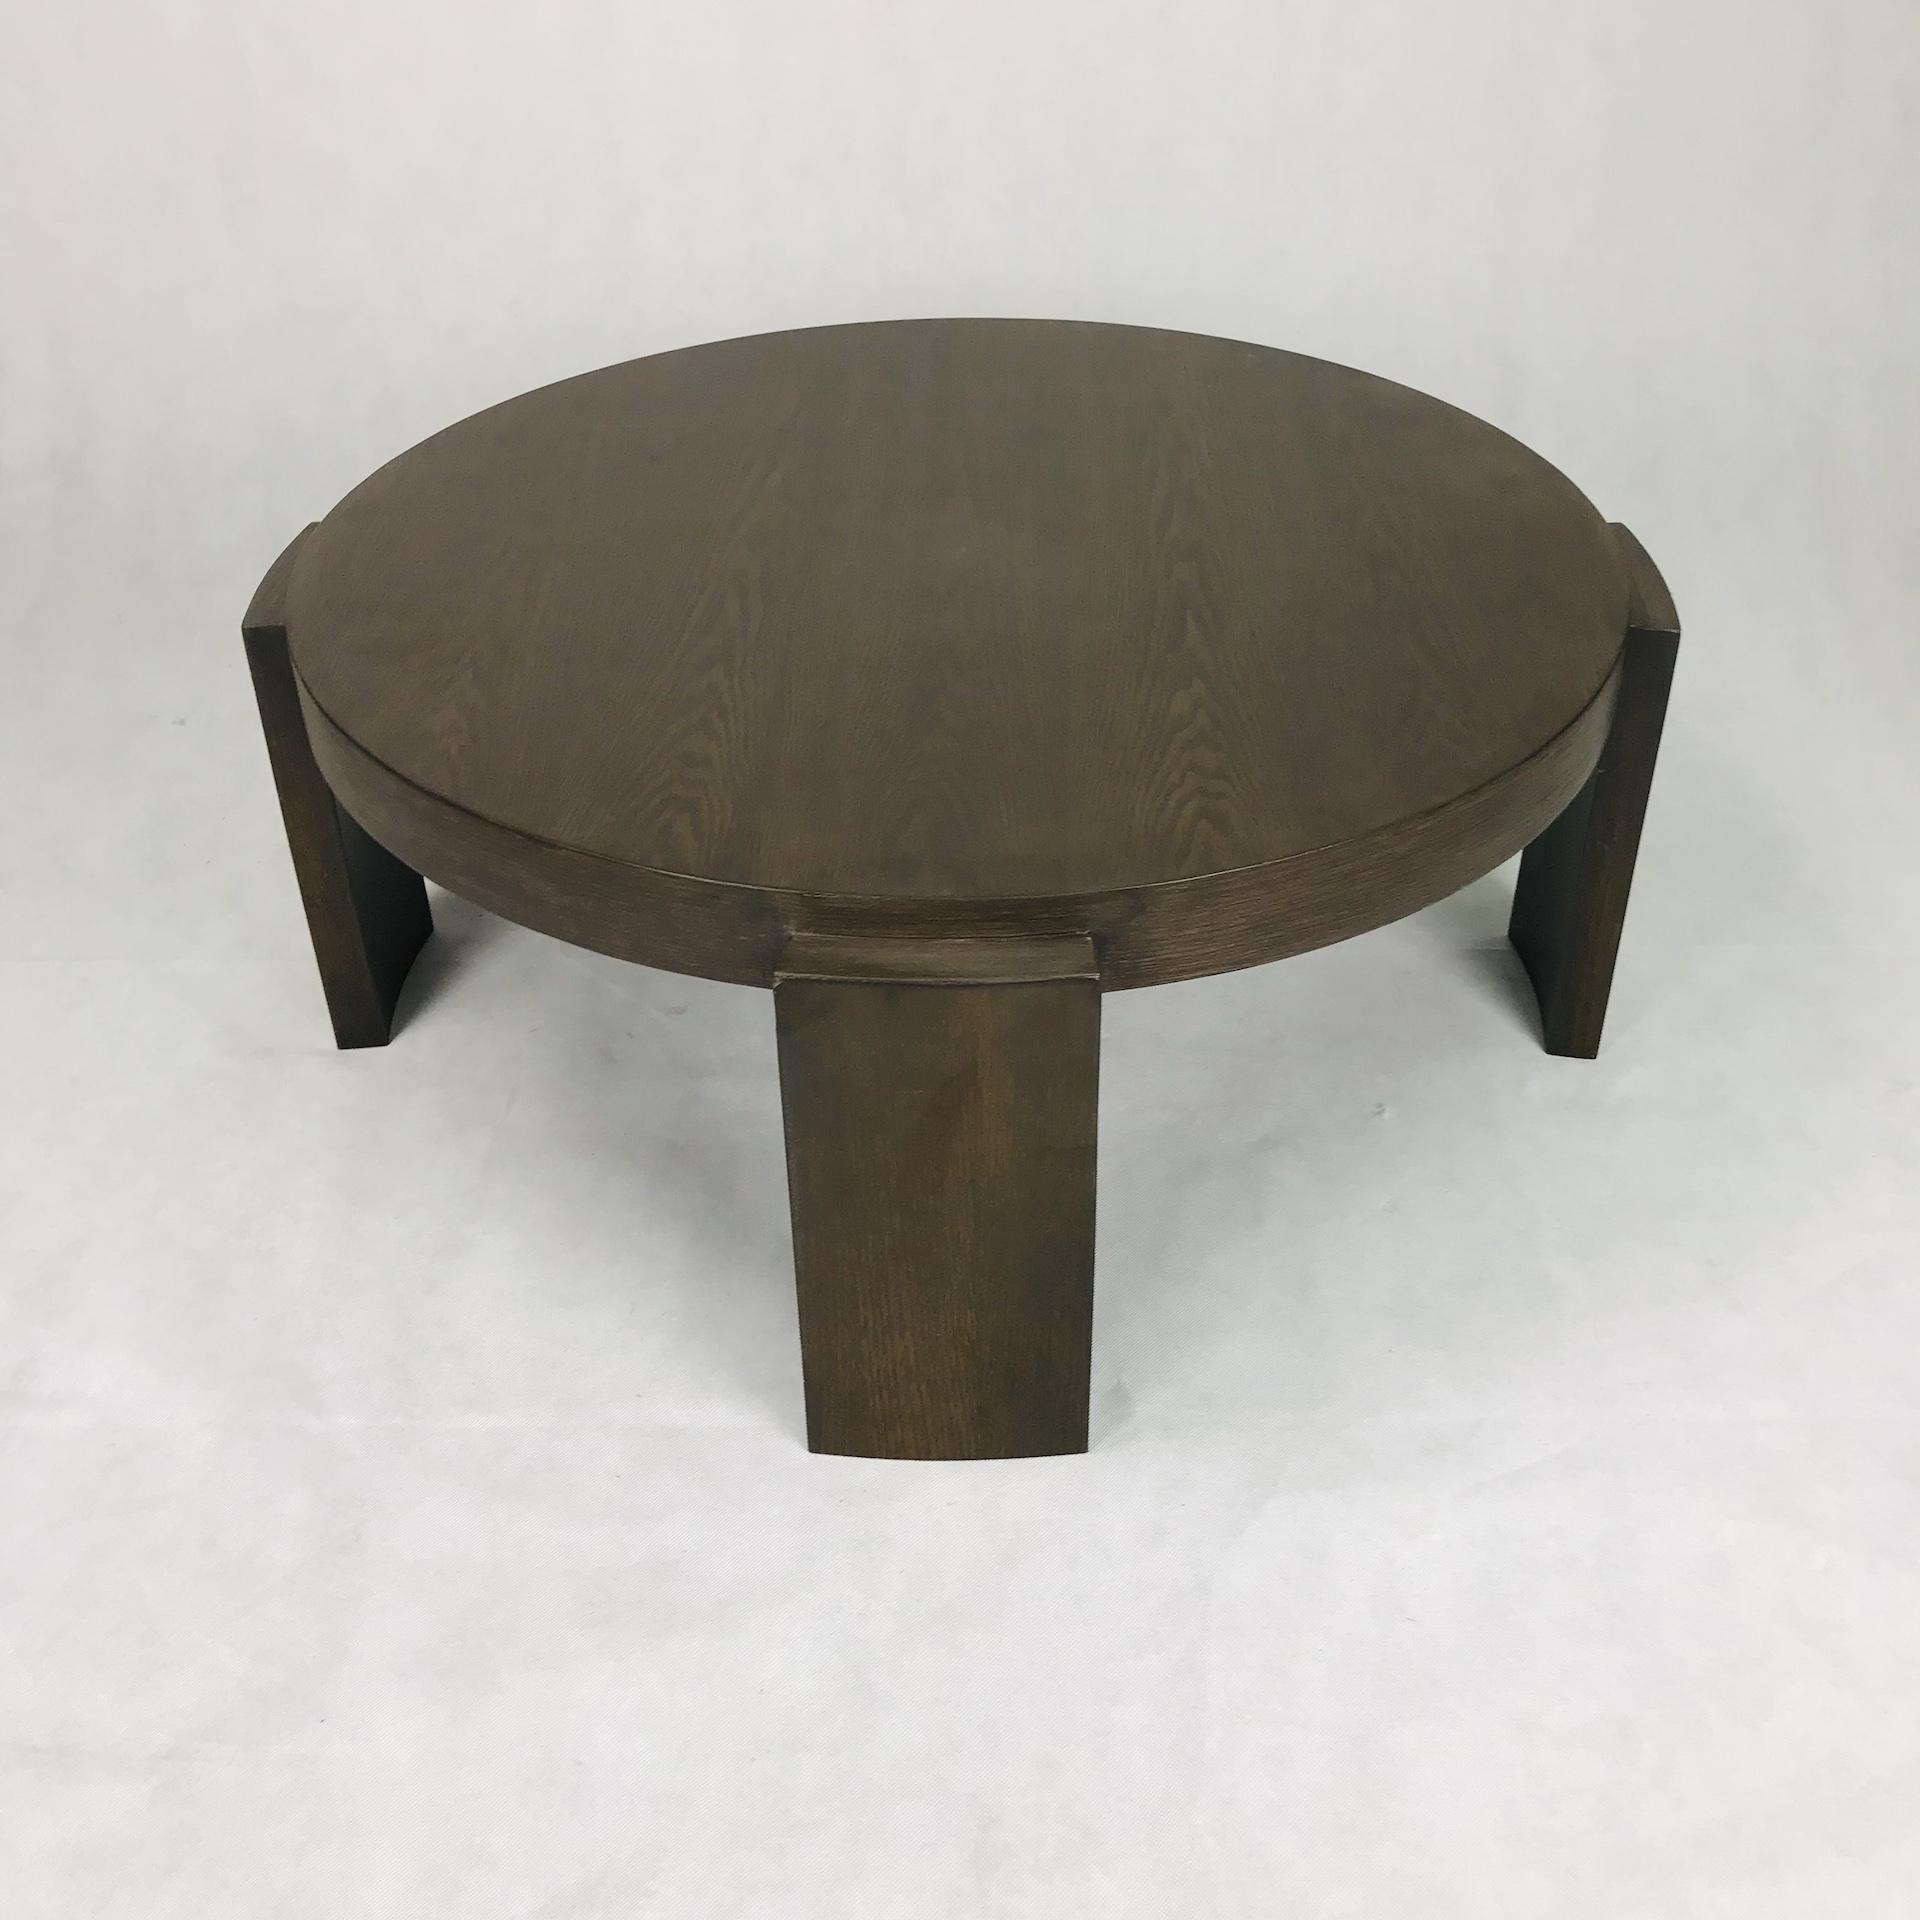 Oak Coffee Table - Round Design